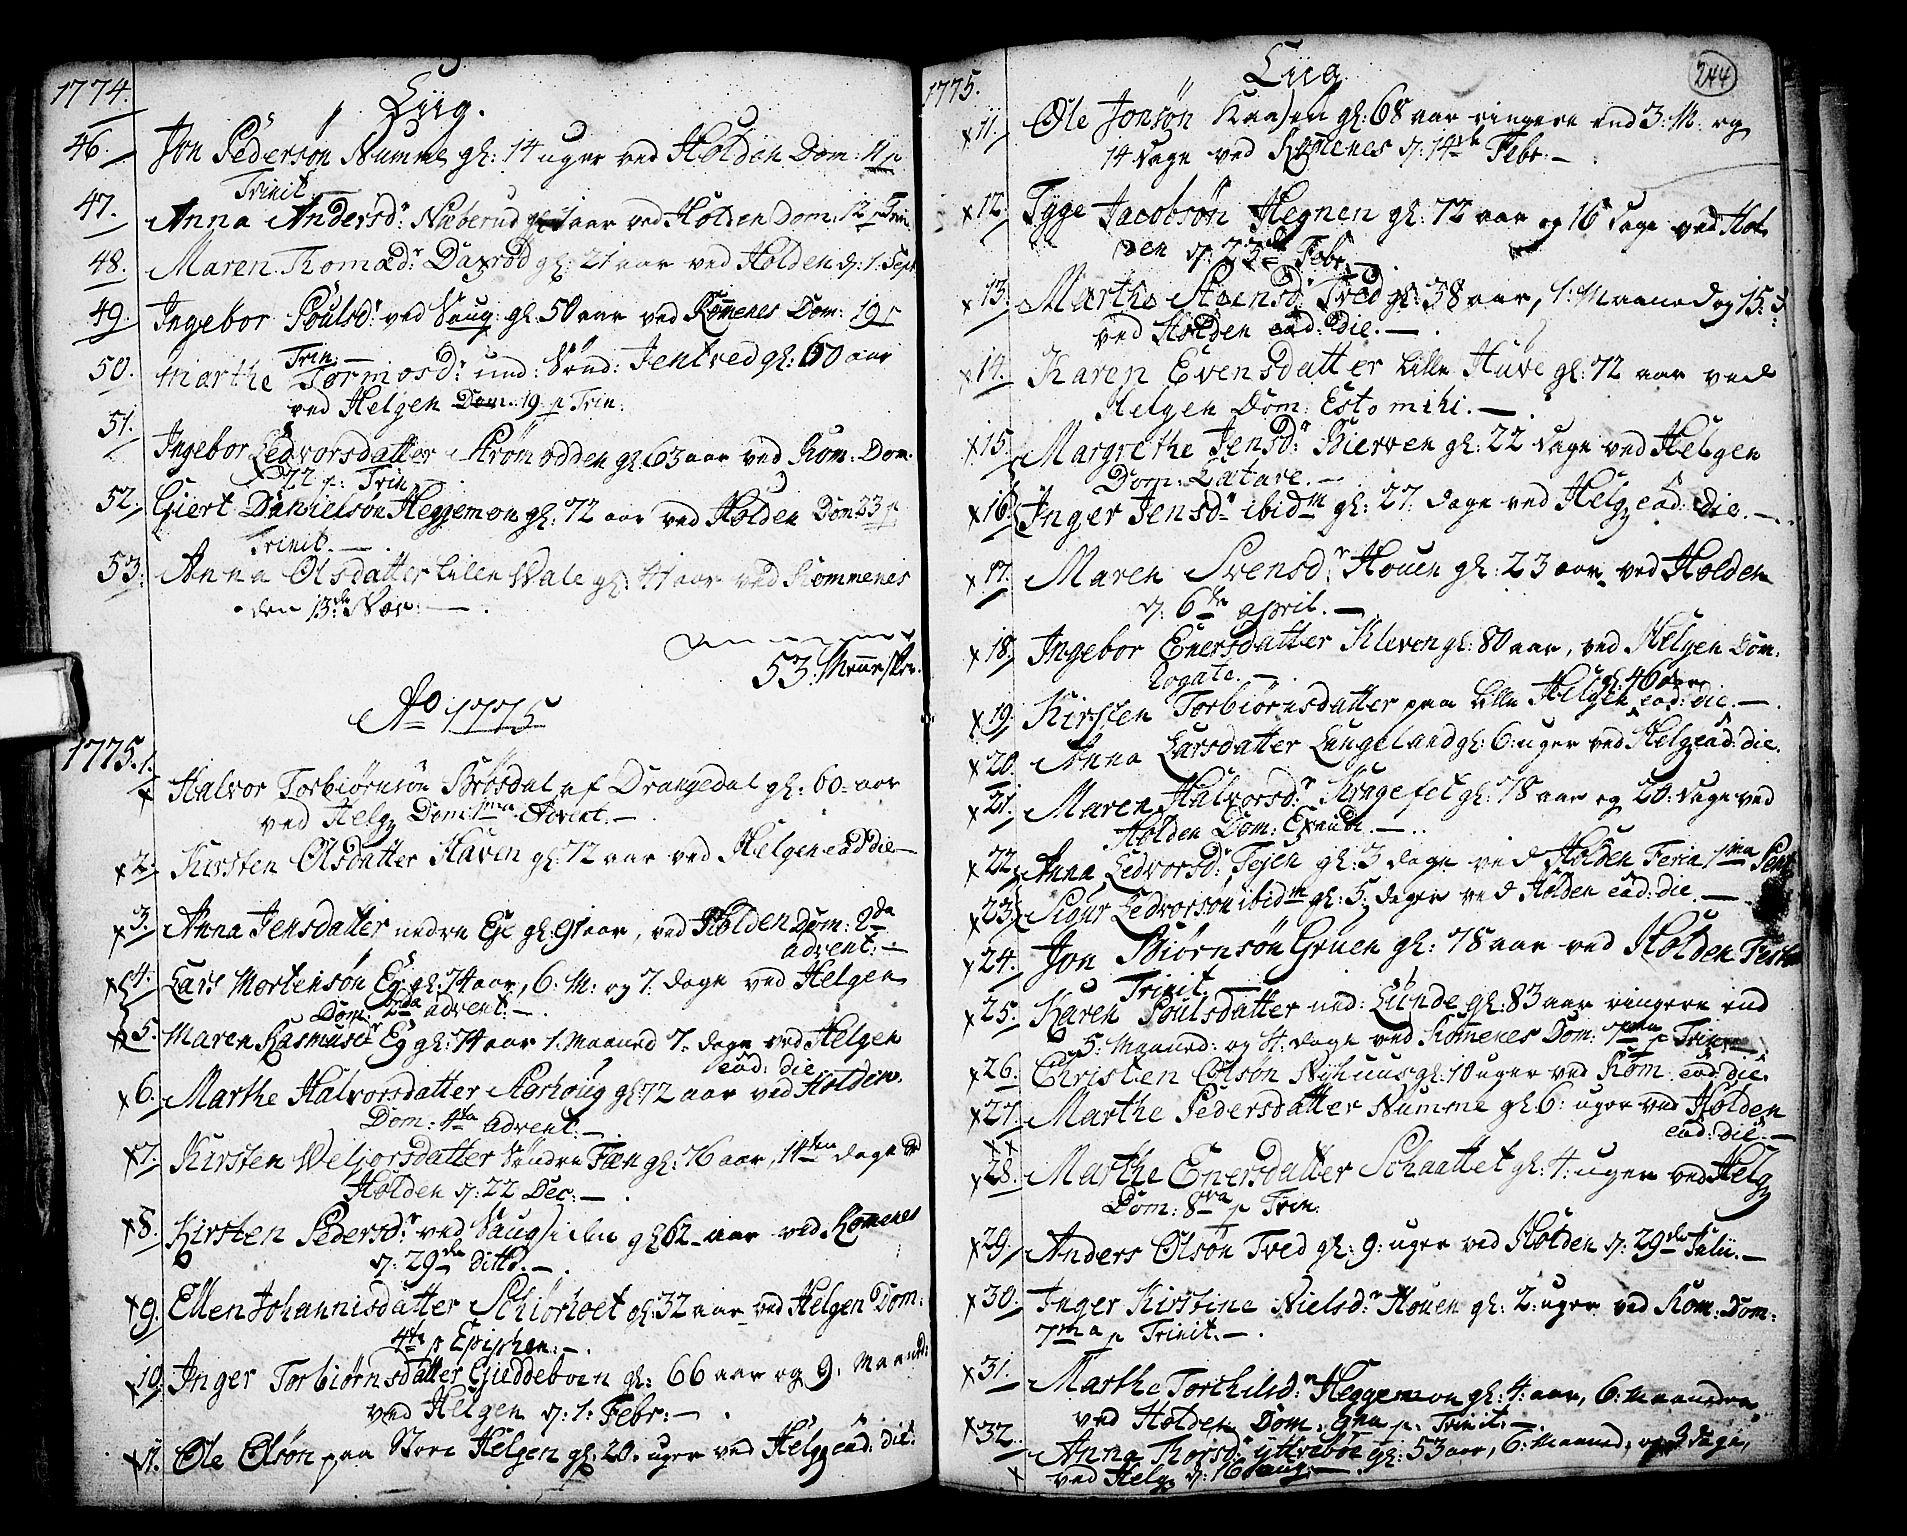 SAKO, Holla kirkebøker, F/Fa/L0001: Ministerialbok nr. 1, 1717-1779, s. 244